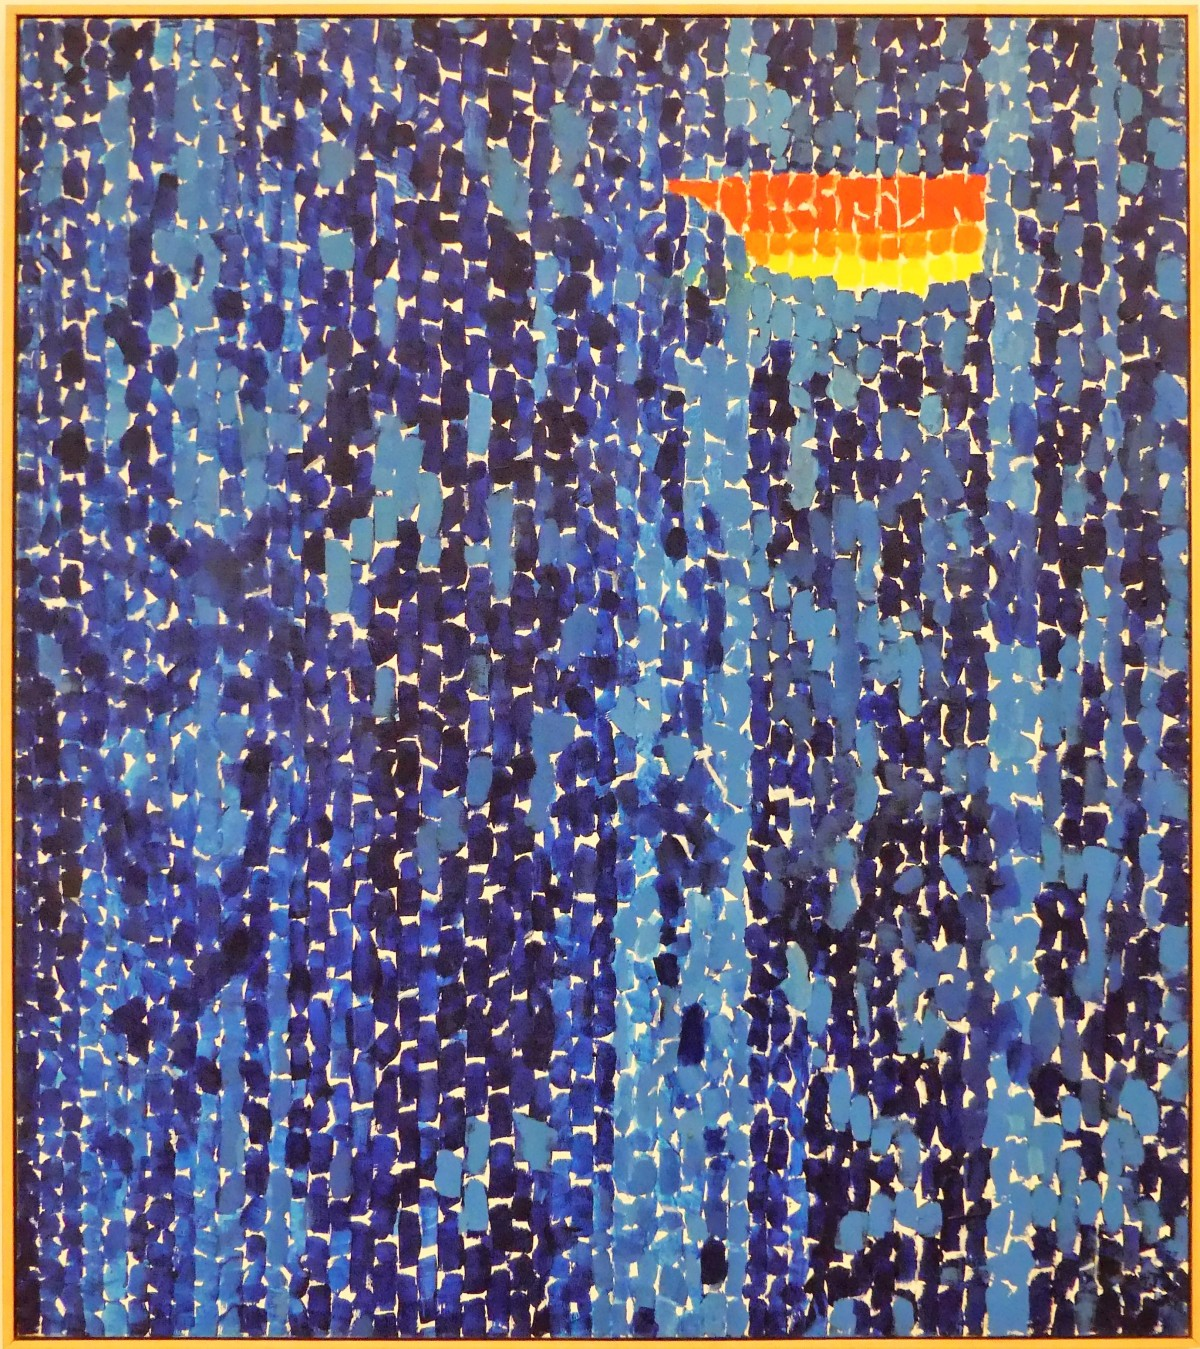 Alma Thomas's Starry Night and the Astronauts